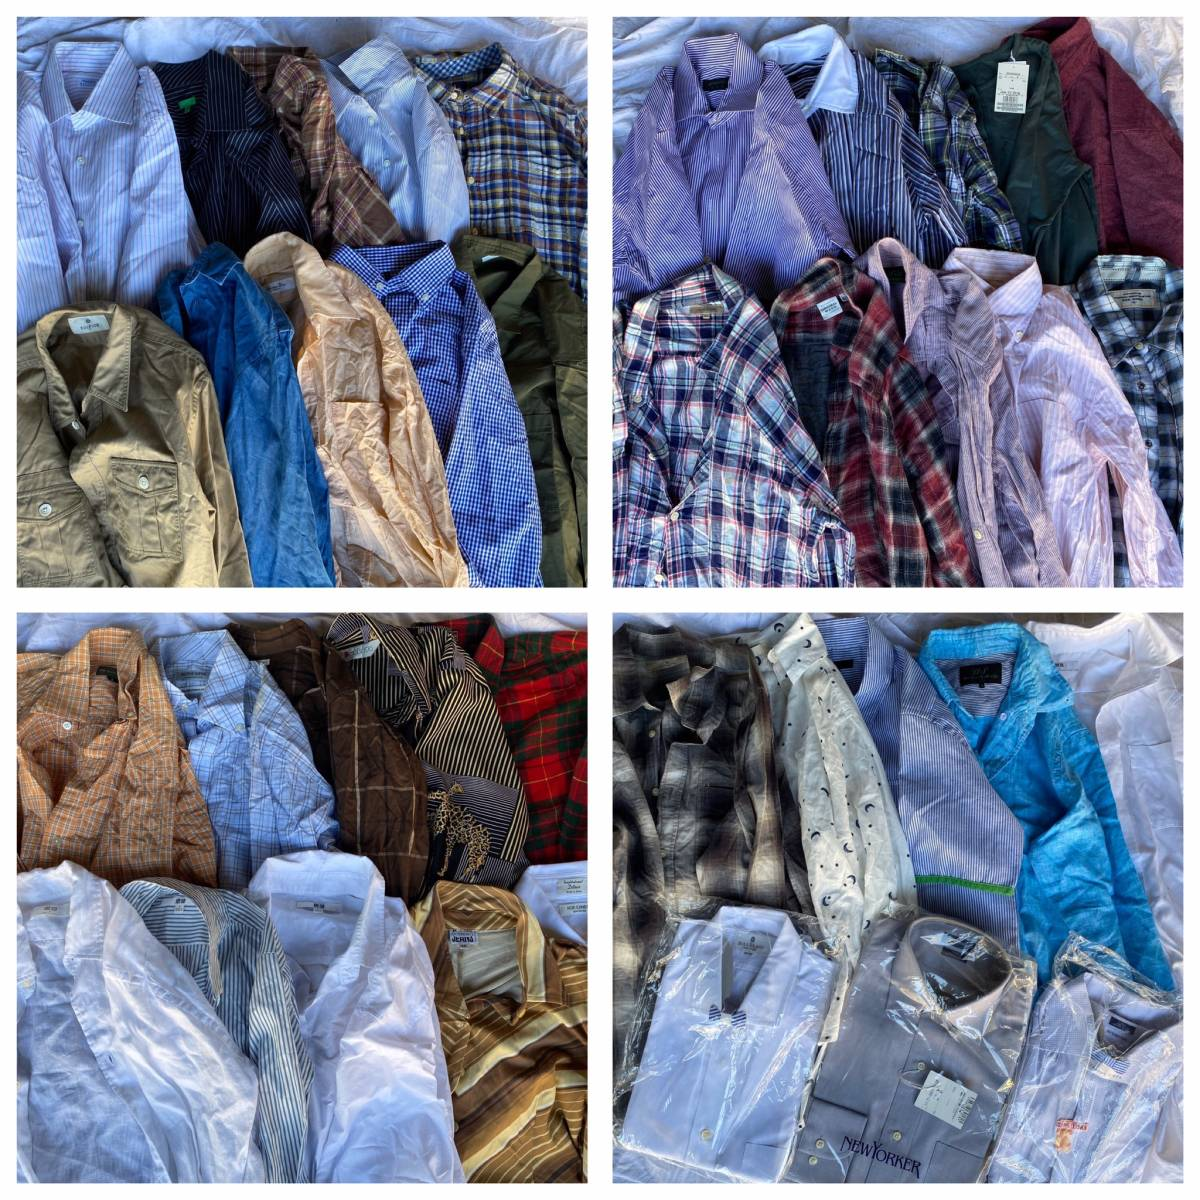 M68*大量*メンズブランドシャツ! 38枚 ディオール、パパス等 セット まとめ売り メンズ シャツ まとめ 古着 色々 卸 洋服 ベール 業販